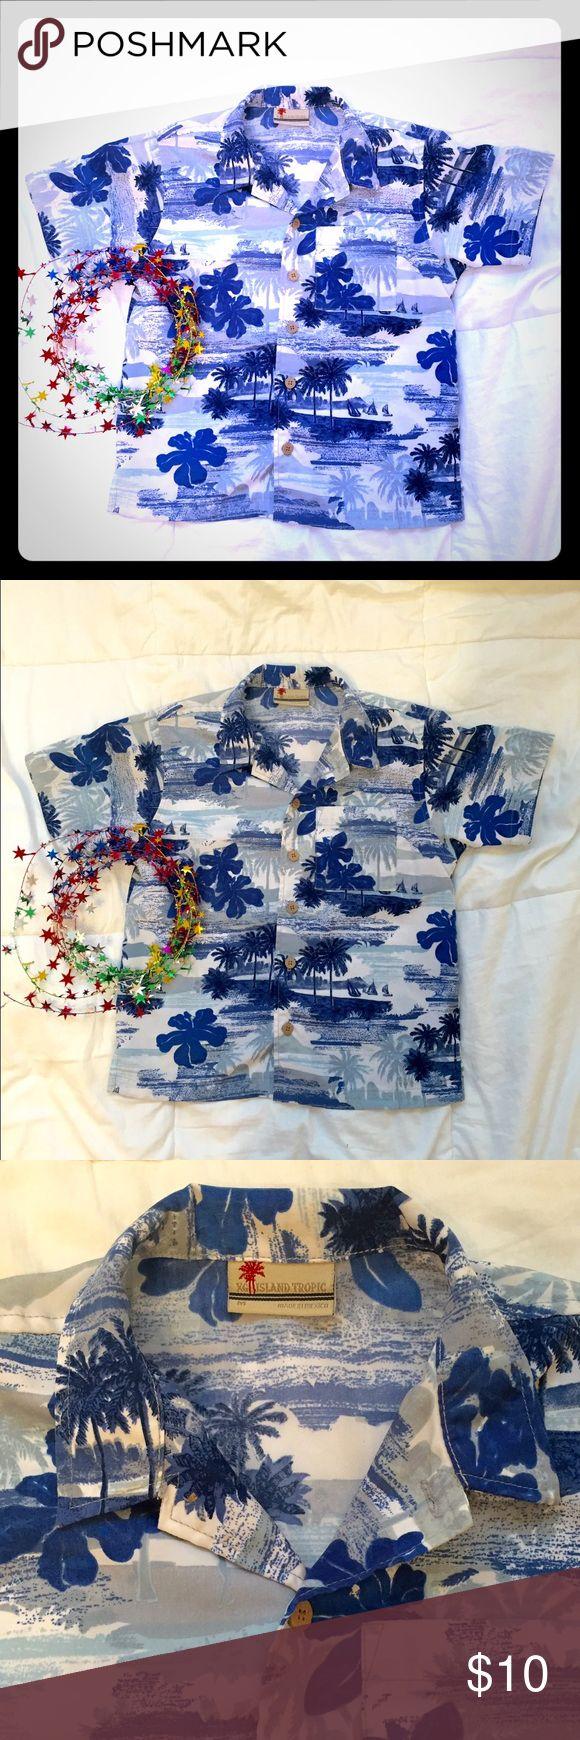 Boys Hawaiian Shirt Super cute Boys Hawaiian Shirt   Size Medium. I believe its a size 6/7. This is based on when my son wore it.  Great fir Hawaiian themed parties or a fun dress shirt.  Collared button down shirt. Shirts & Tops Button Down Shirts